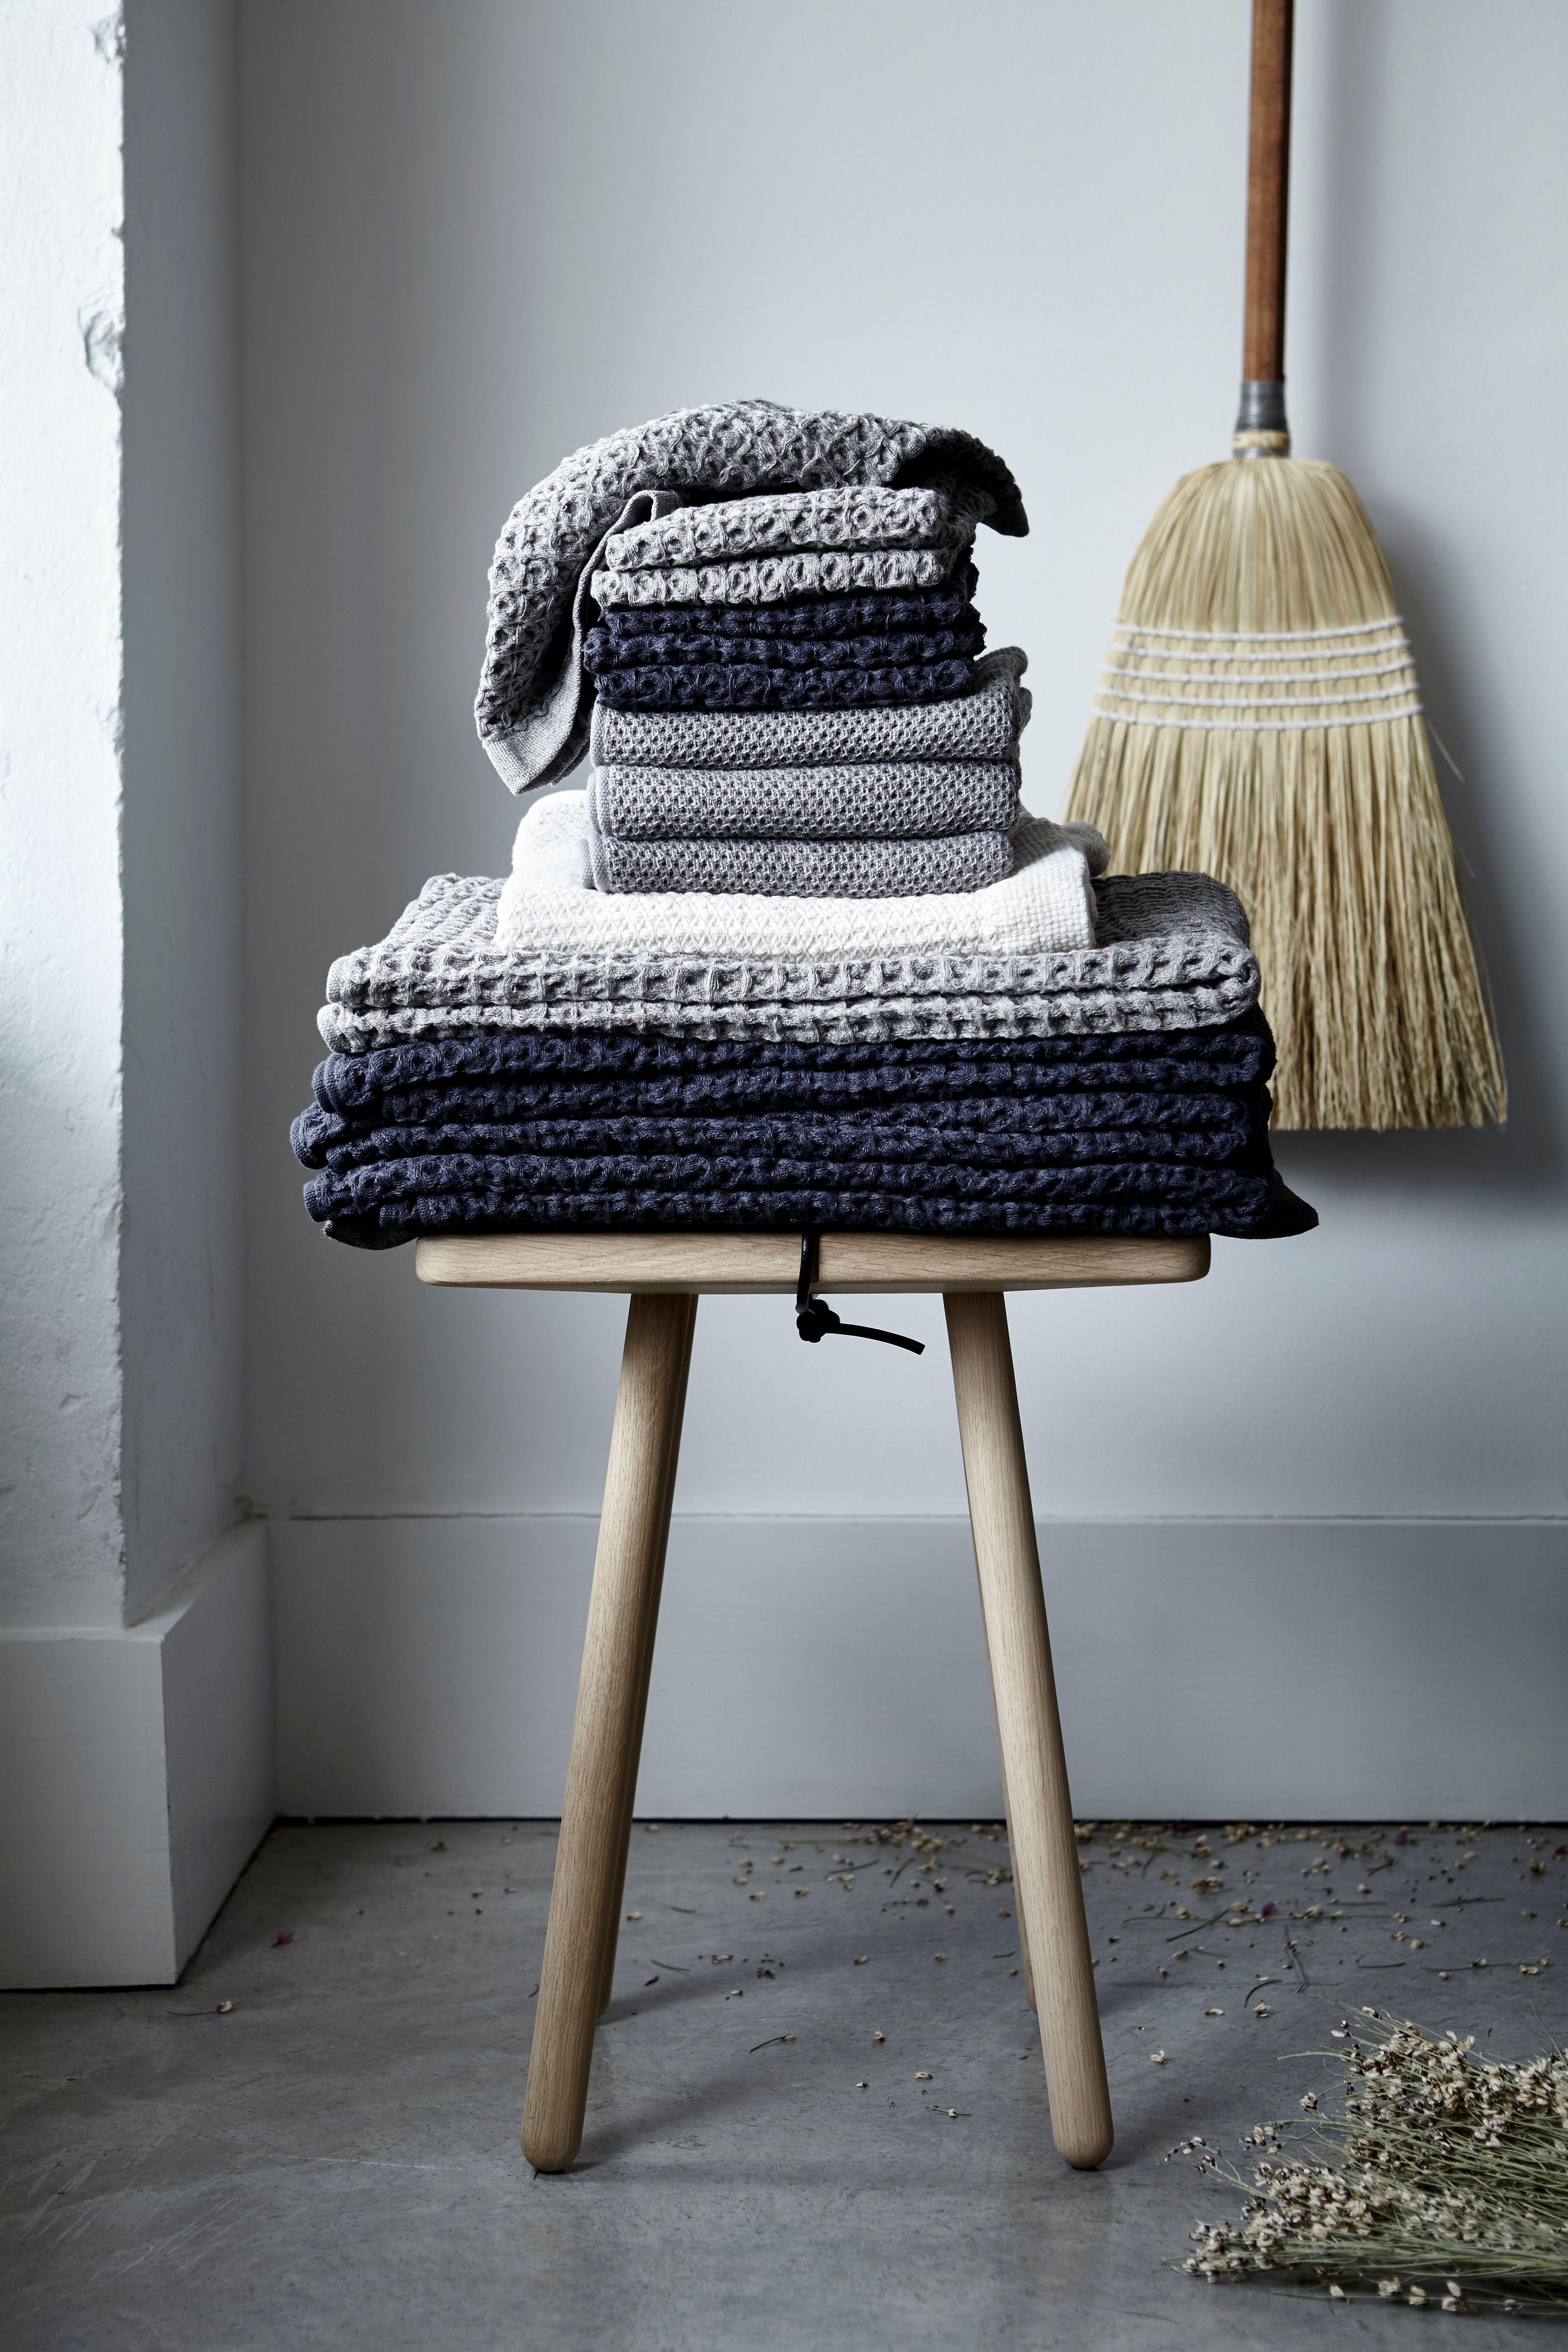 Randy-Par-Towels1.jpg